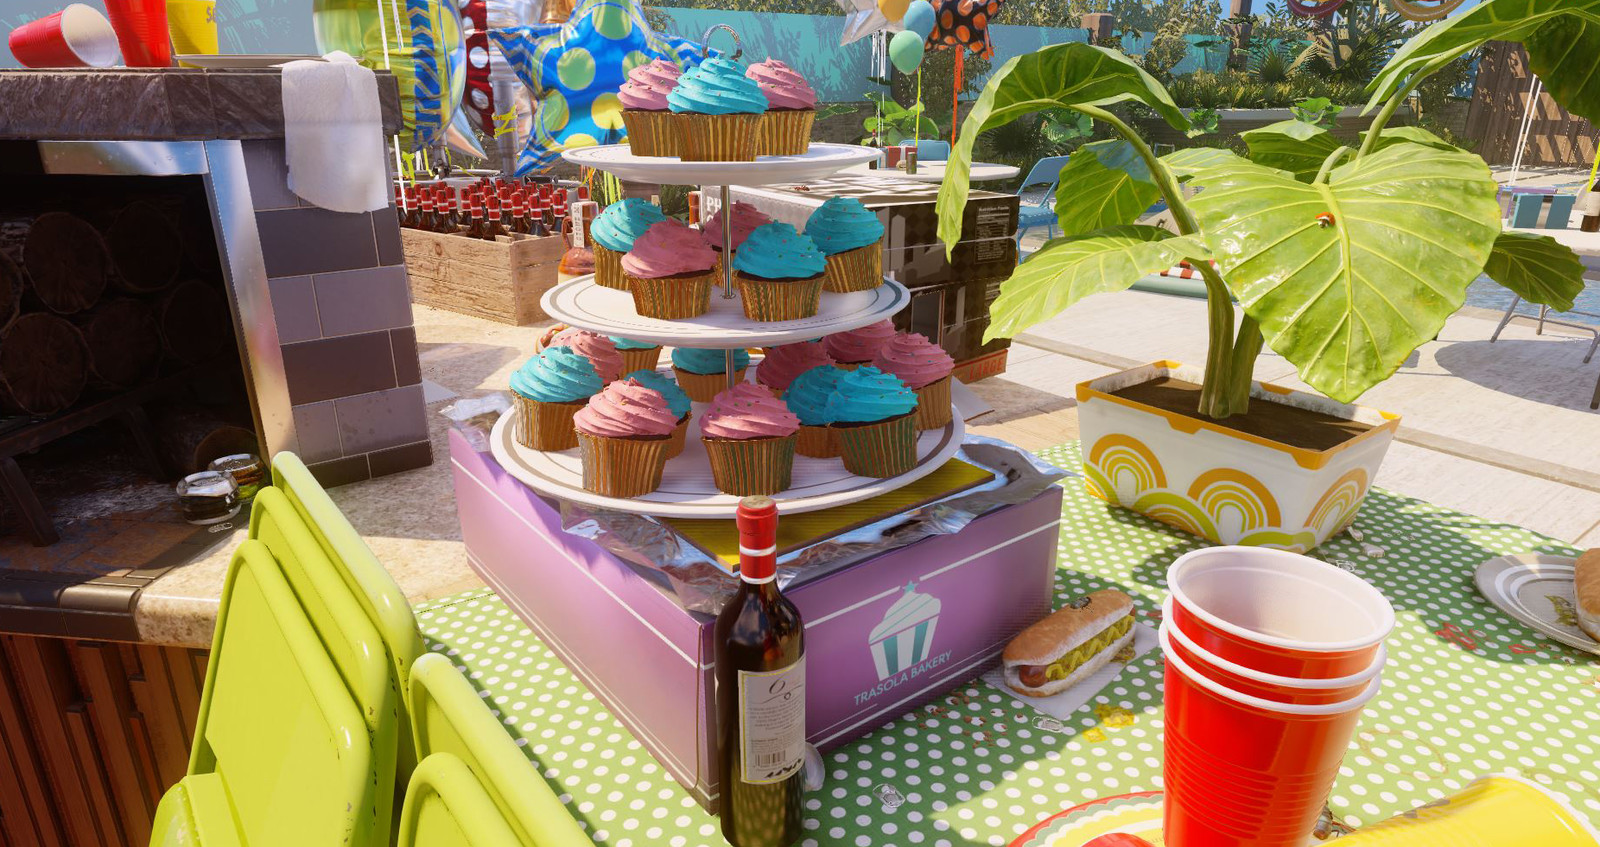 Cupcake box and tower.